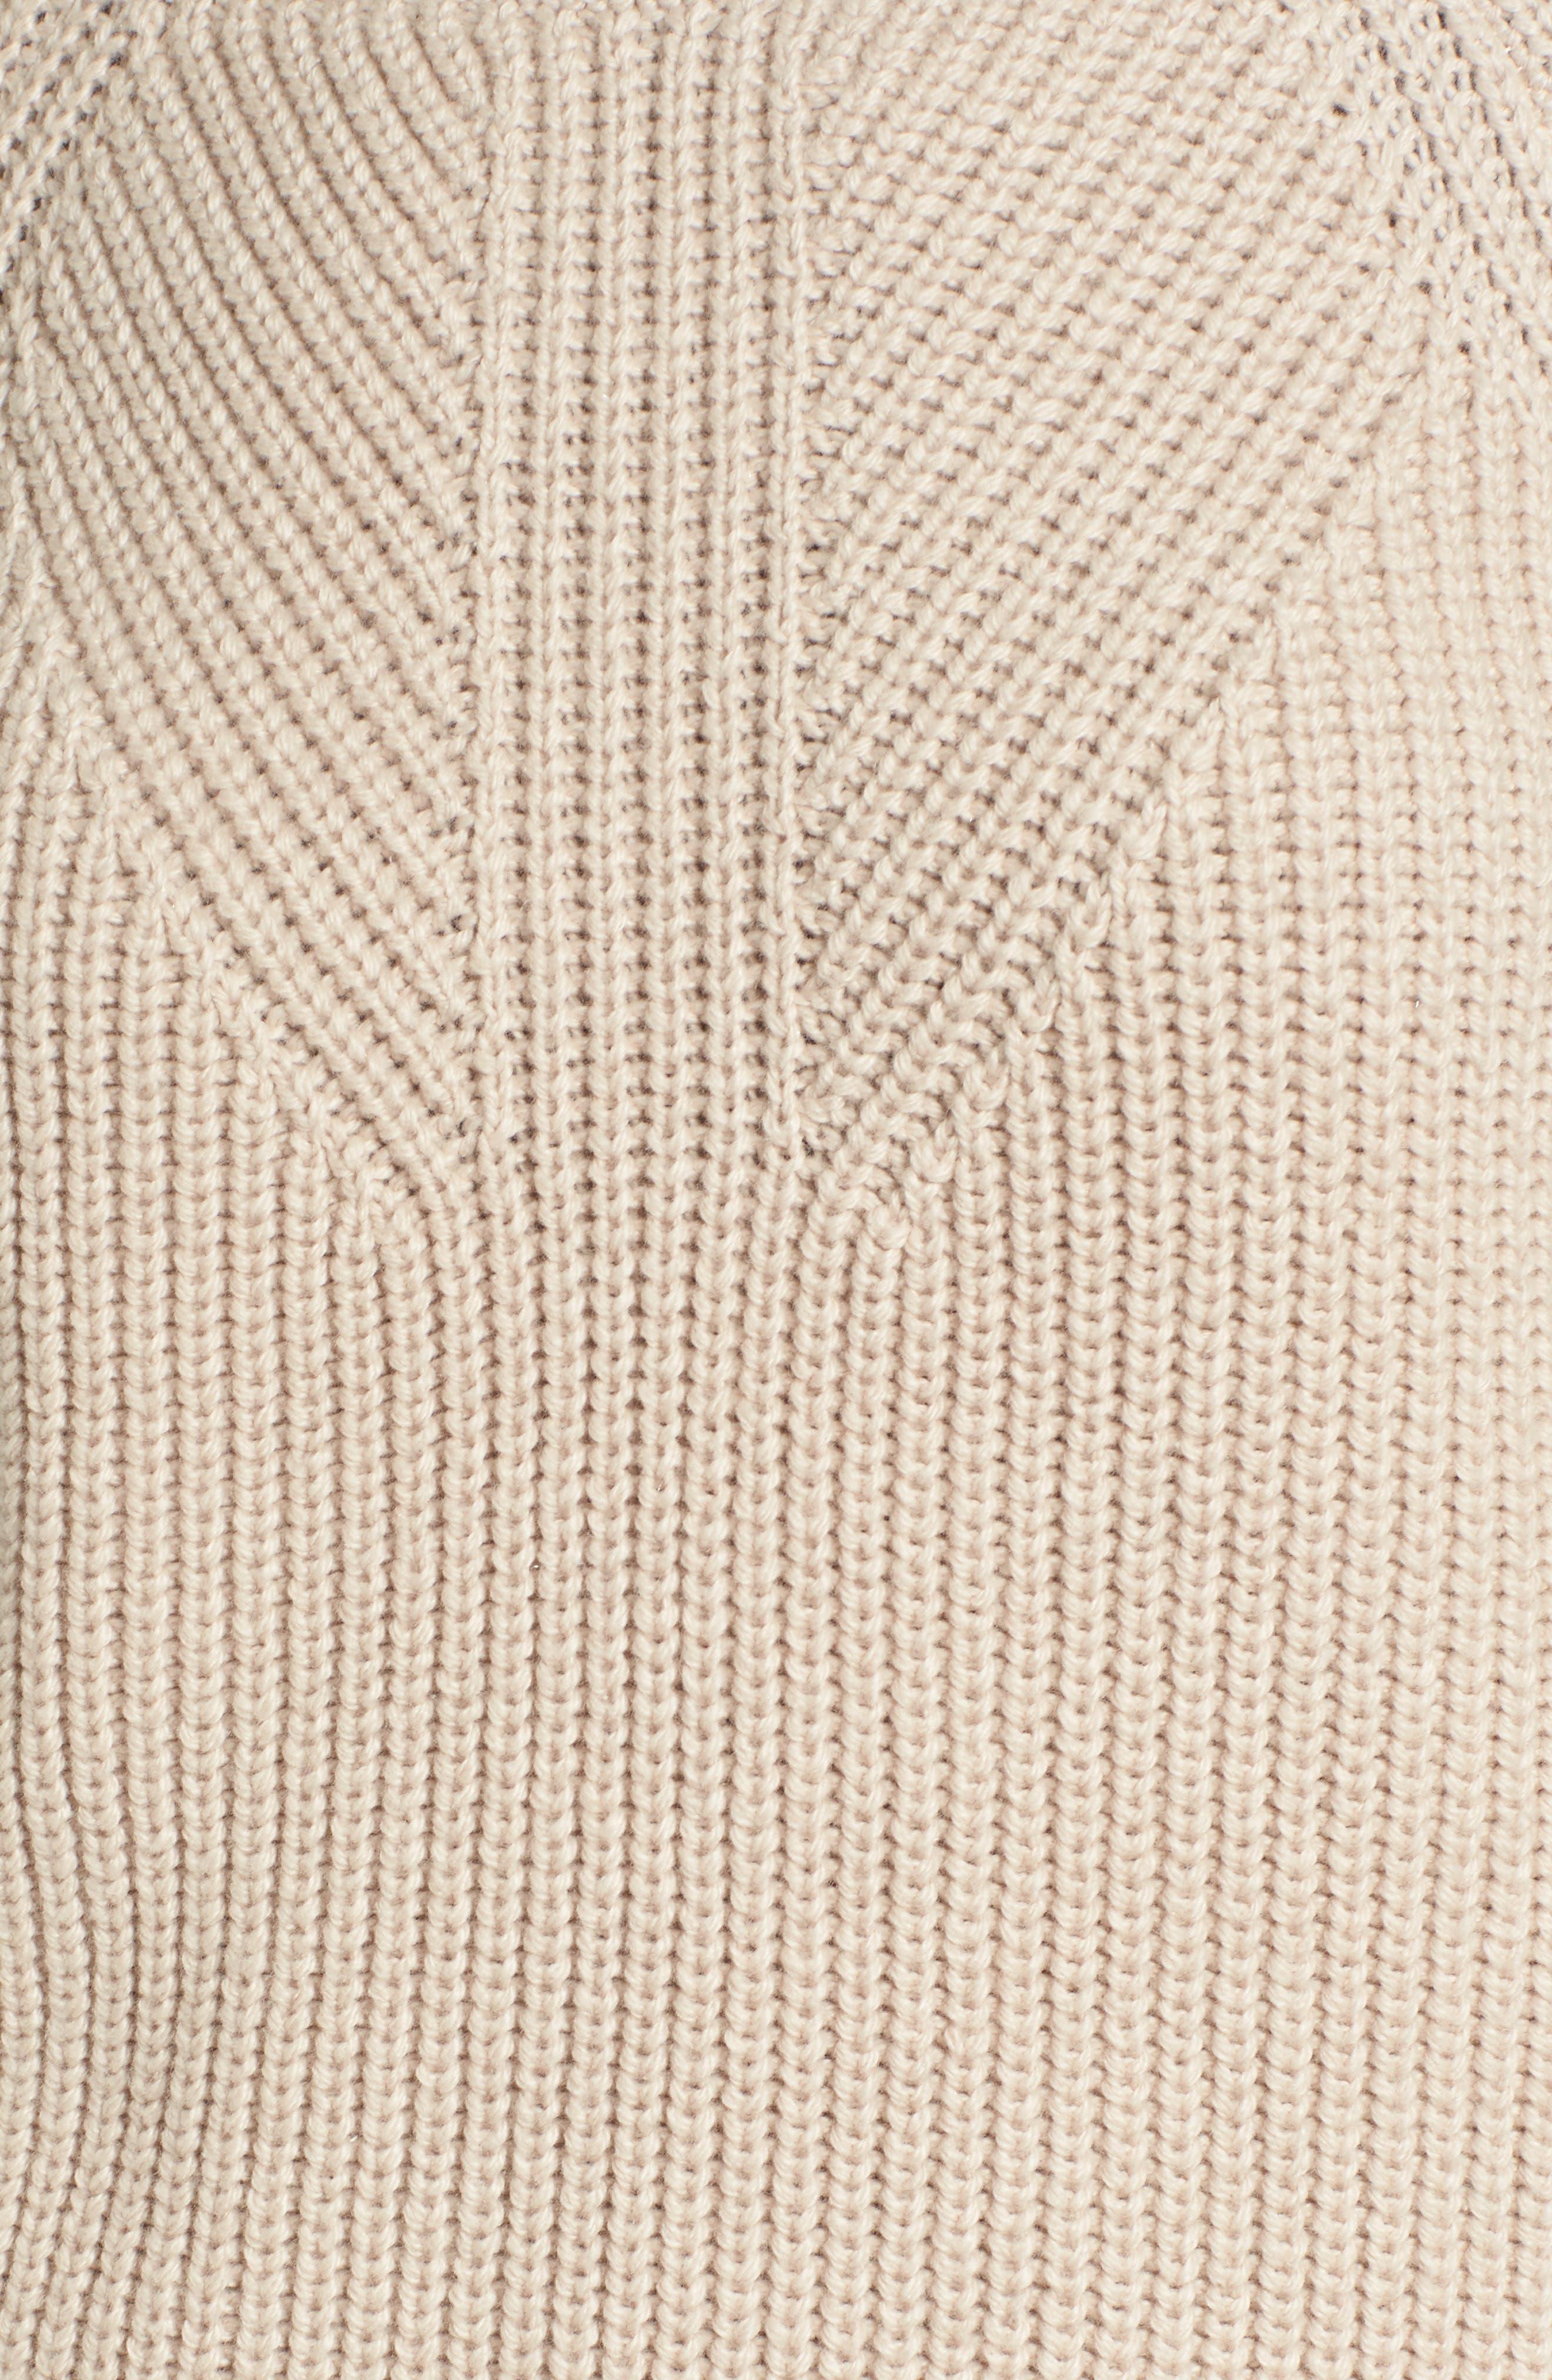 Shaker Stitch Sweater,                             Alternate thumbnail 5, color,                             270